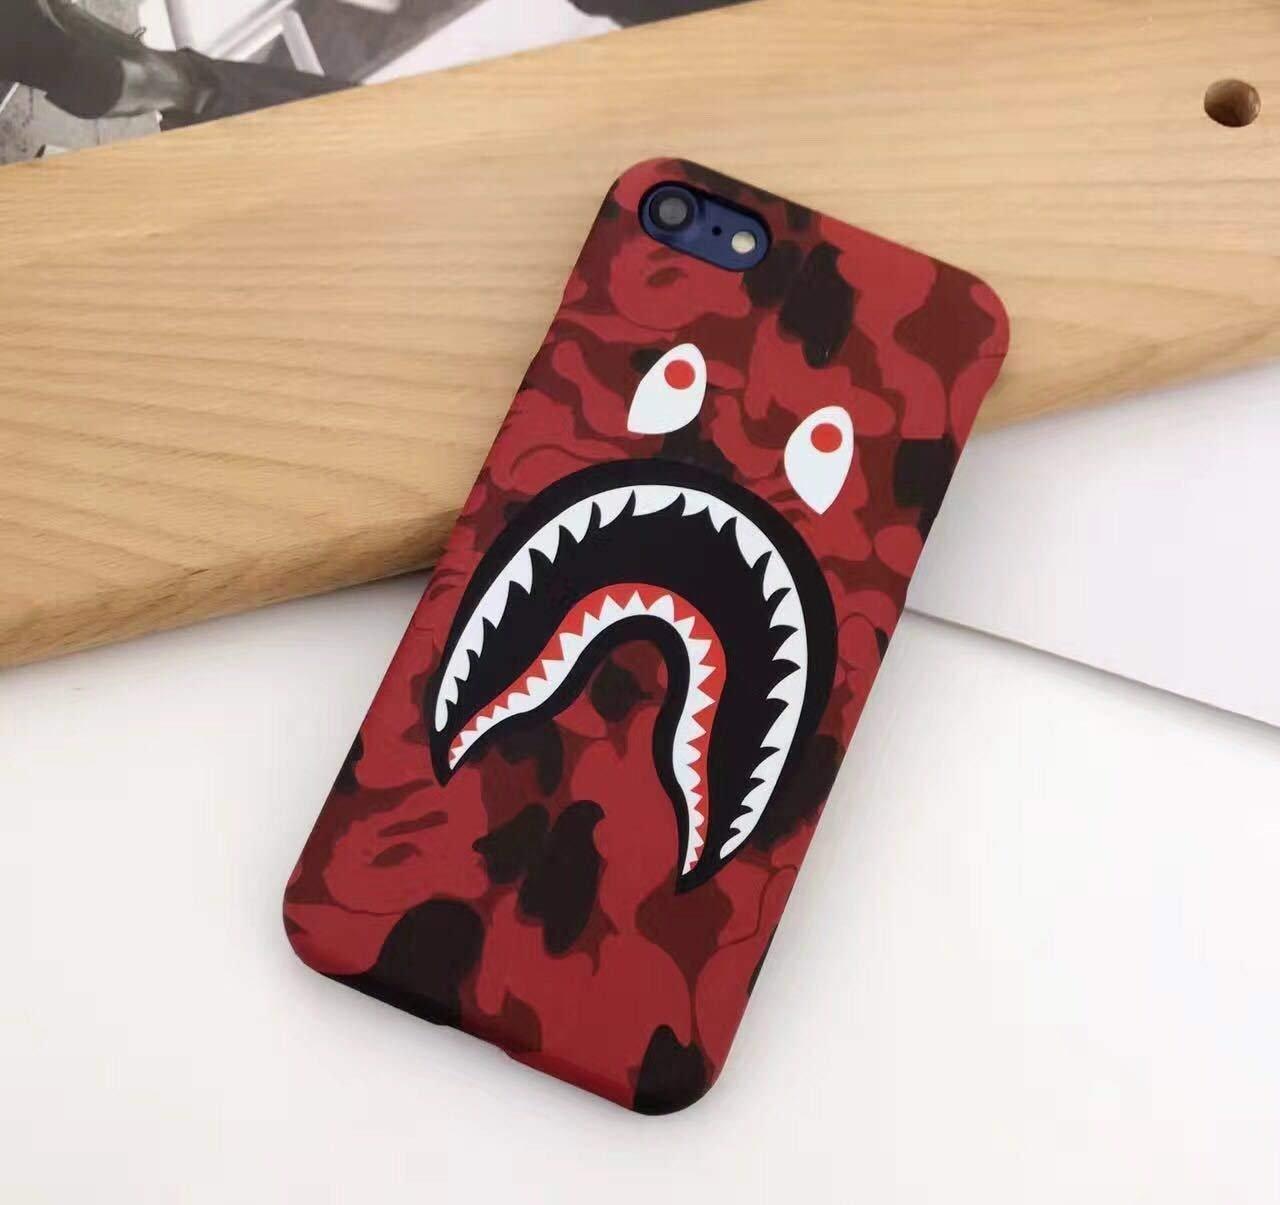 the best attitude de97b f6279 iPhone 7 Plus/ 8 Plus Case, A Bathing Ape (Bape) Slim Protective Premium  Hard Case for iPhone 7 Plus/ 8 Plus Case (Green Camo)